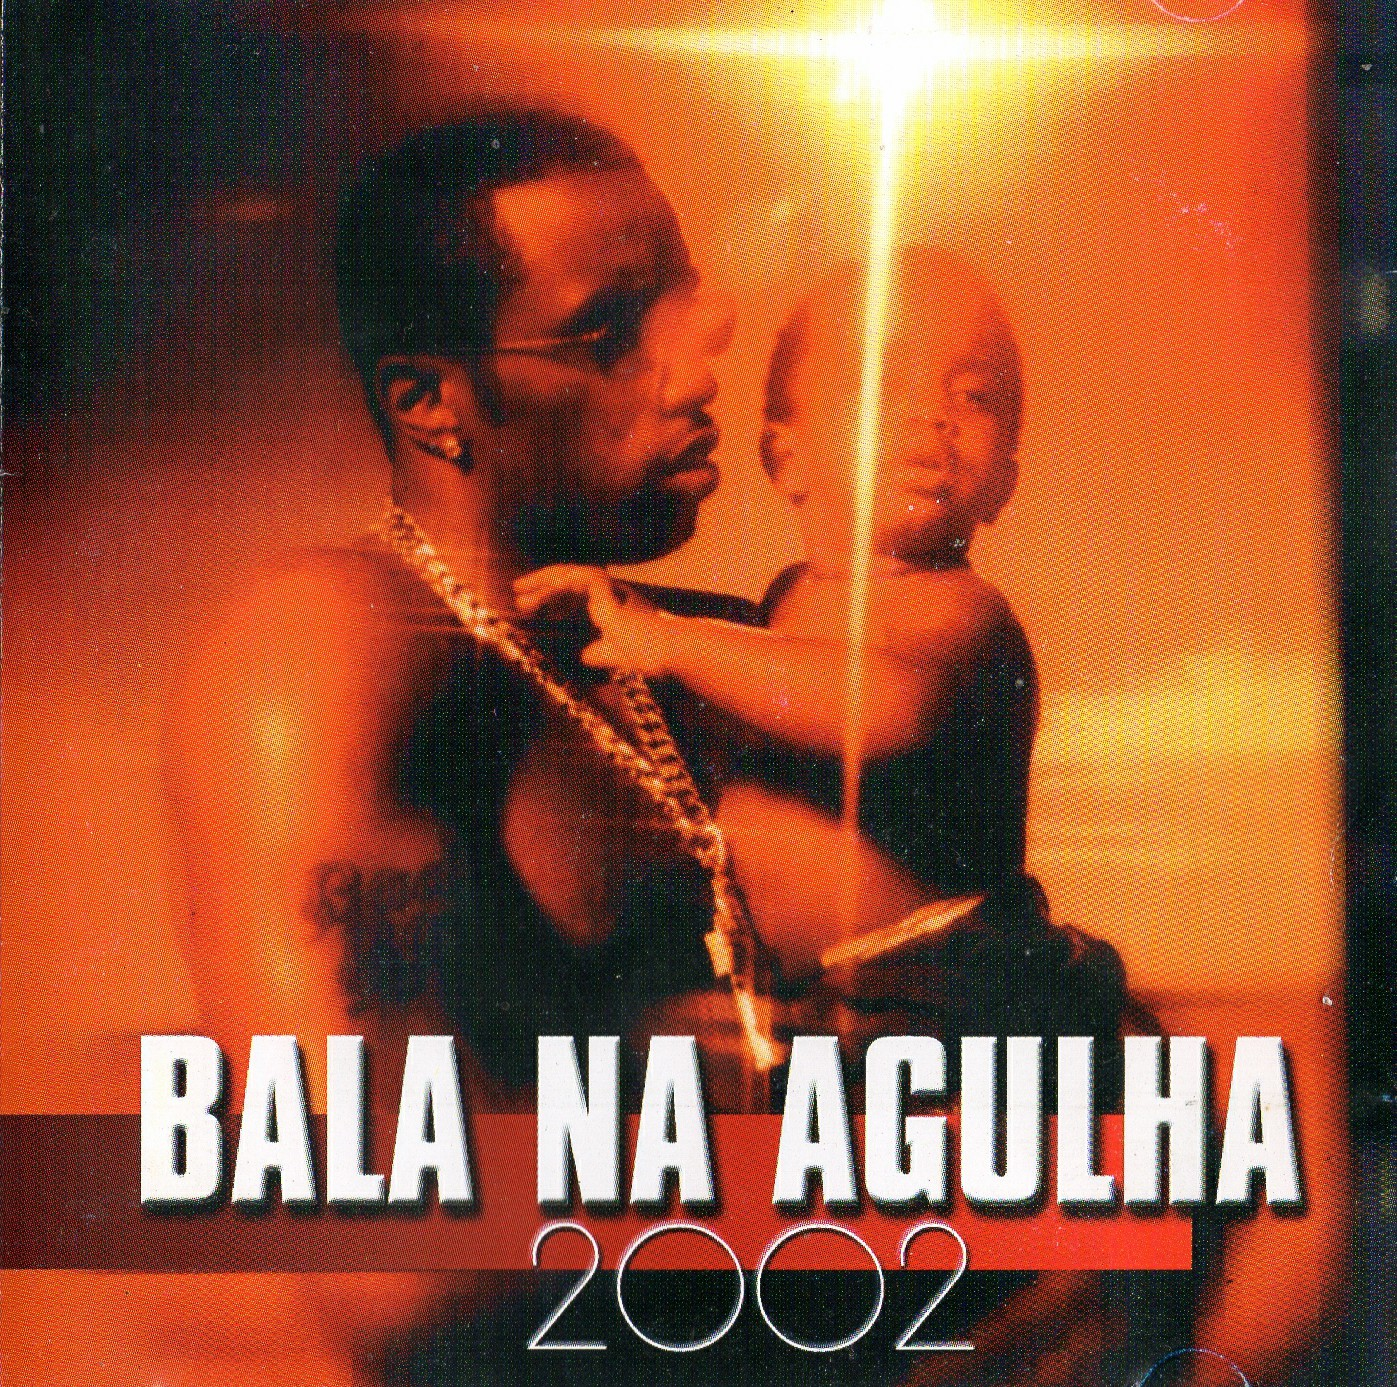 BALA NA AGULHA 2002